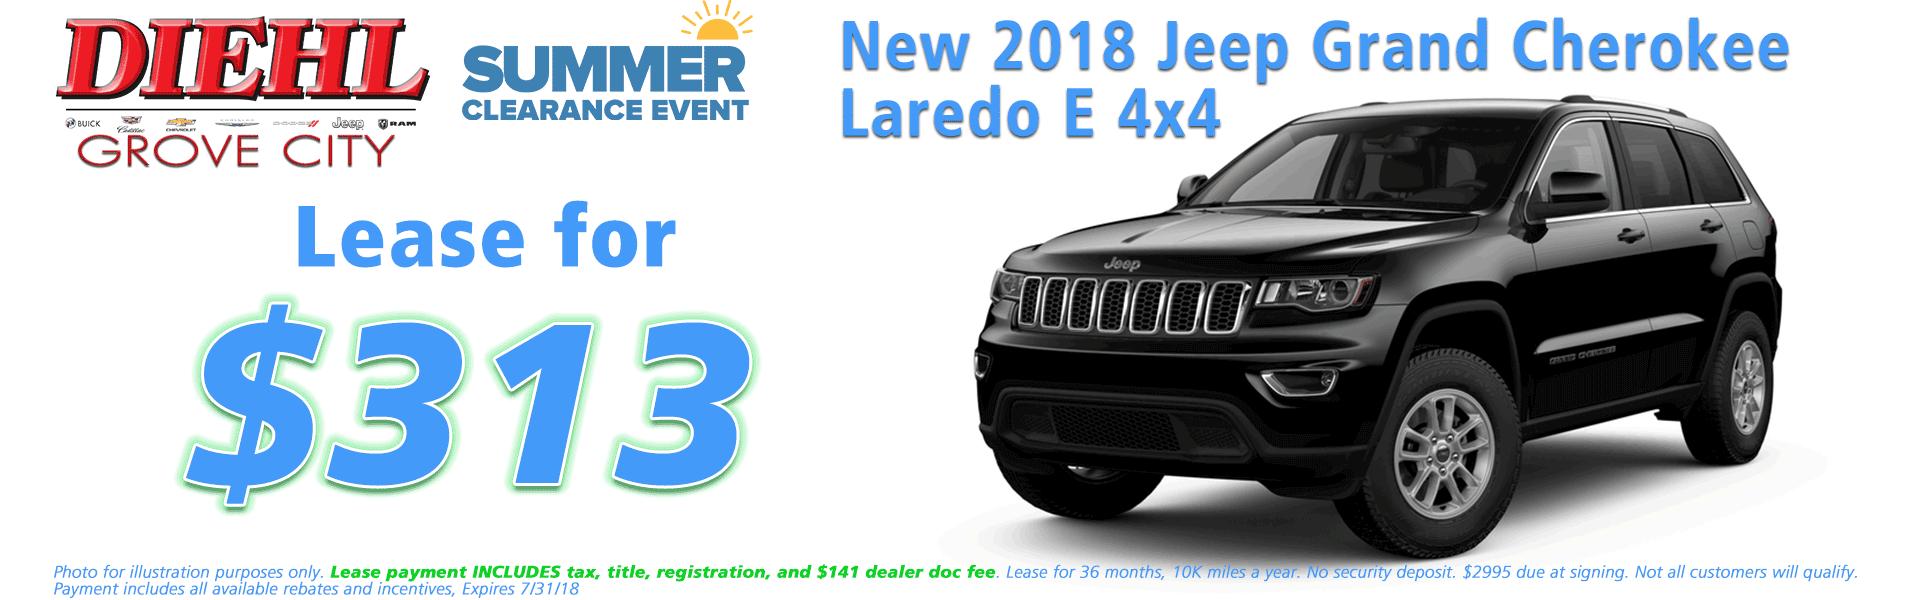 Diehl of Grove City, Grove City, PA 16127 Chrysler Jeep Dodge Ram Chevrolet Buick Cadillac NEW 2018 JEEP GRAND CHEROKEE LAREDO E 4X4